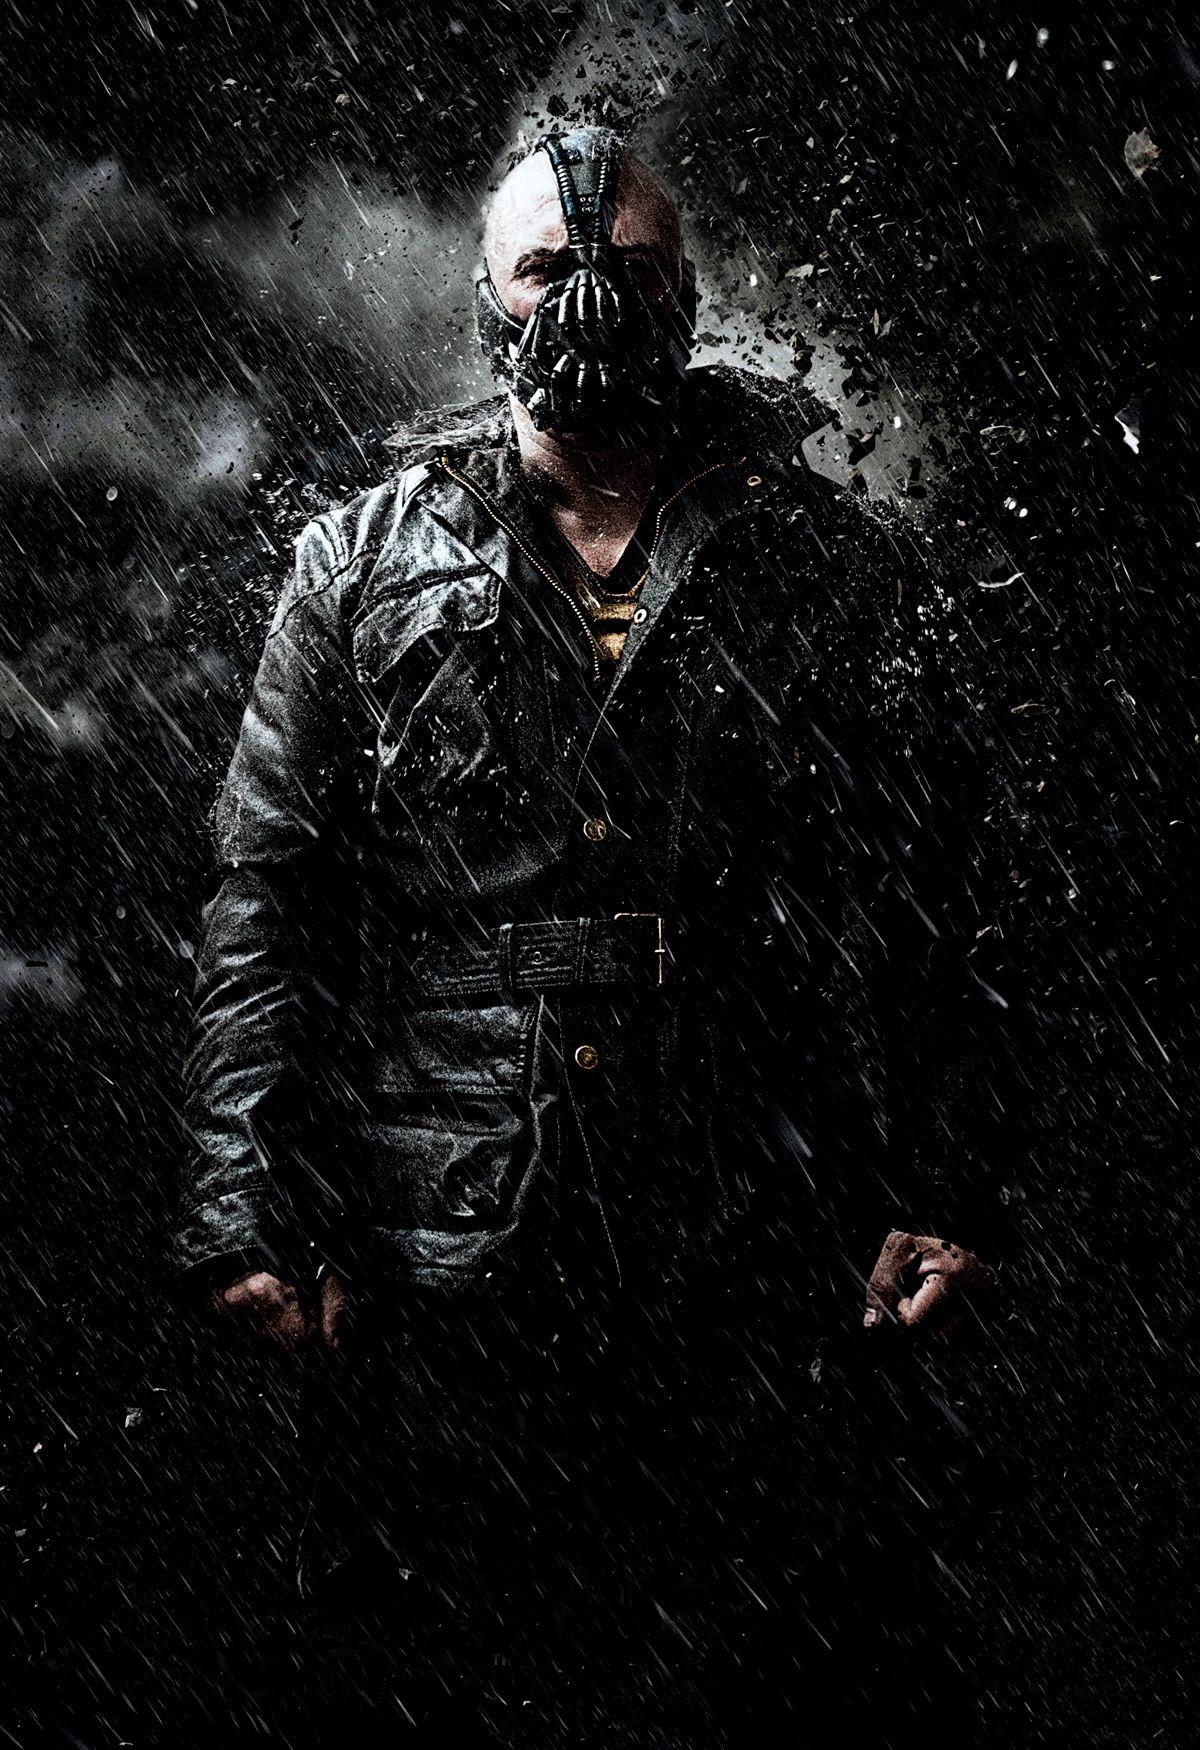 Batman Dark Knight Rises Bane Concept Art